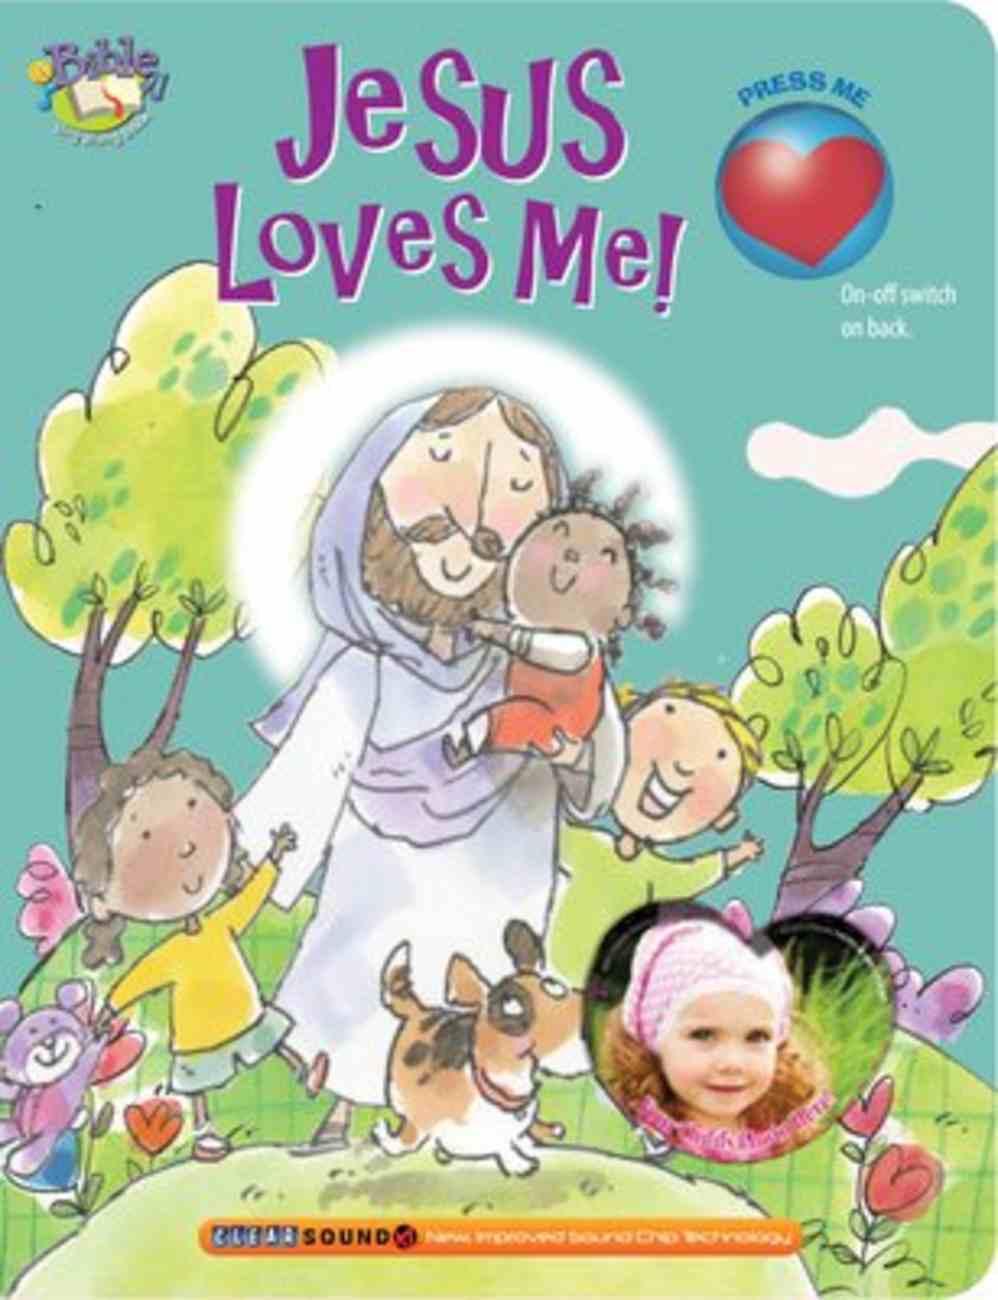 Jesus Loves Me! (My Bible Sing Along Book Series) Board Book